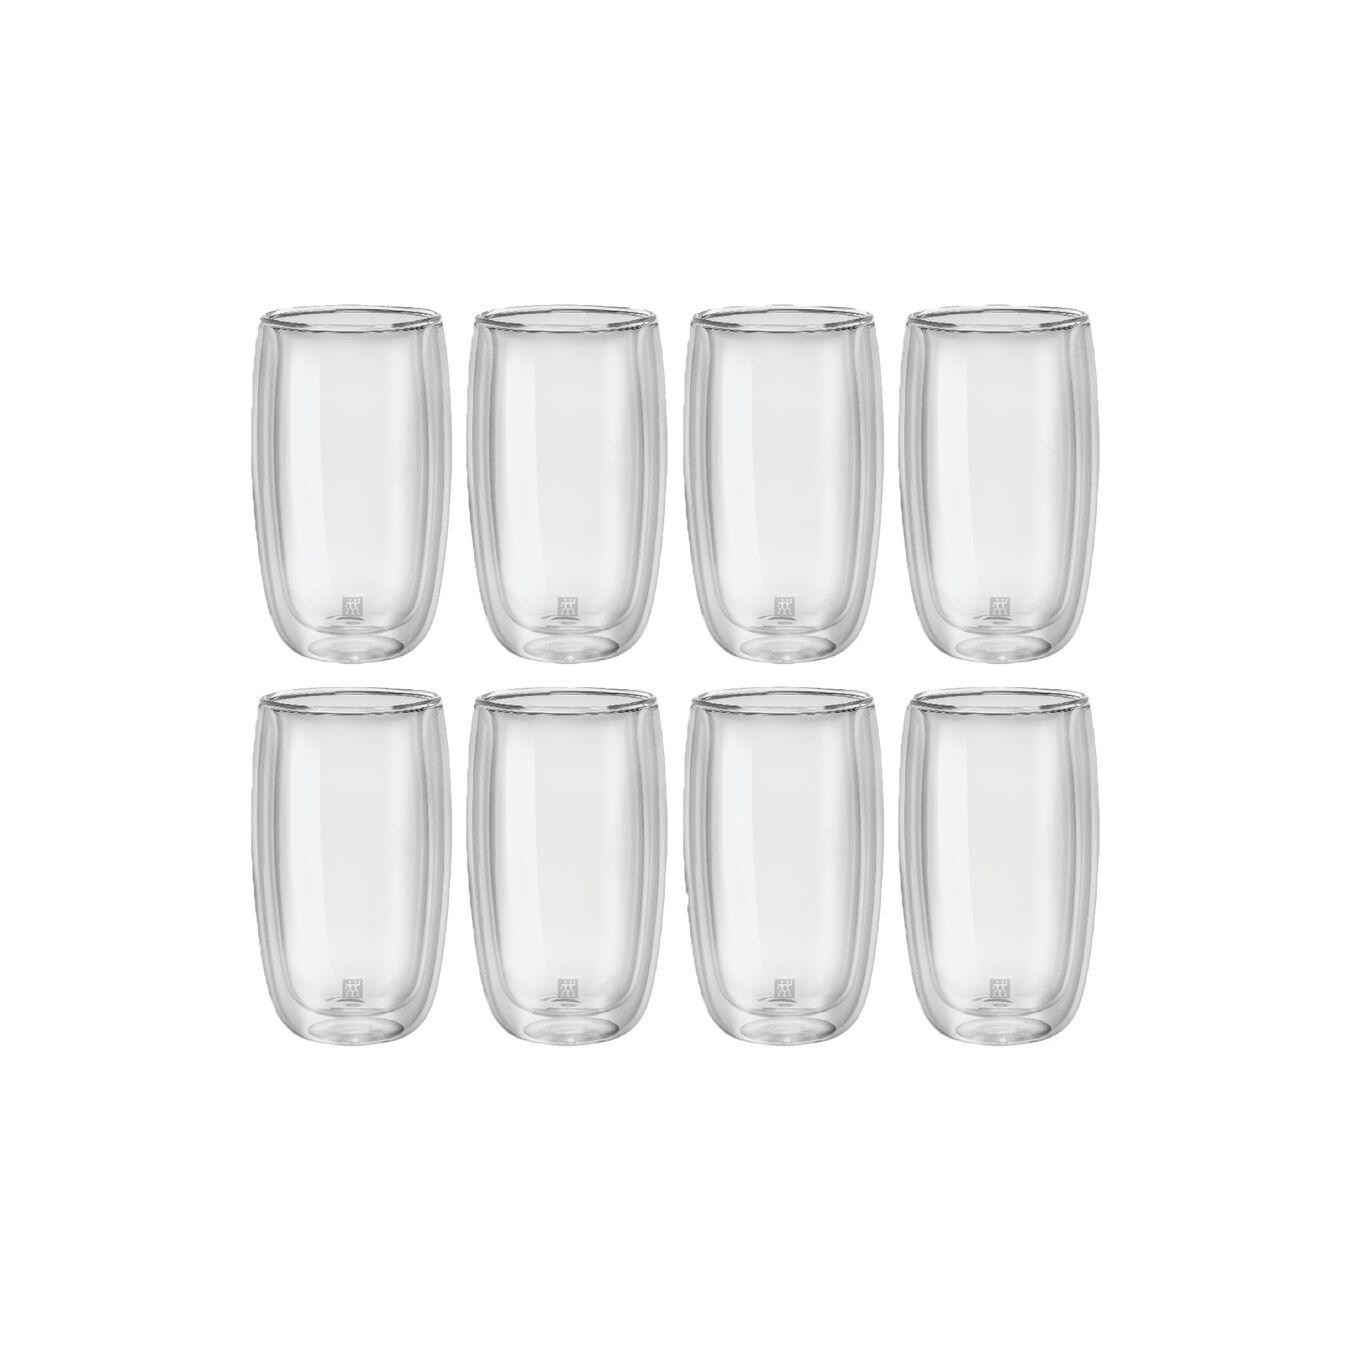 8 Piece Double-Wall Latte Macchiato Glass Set,,large 2